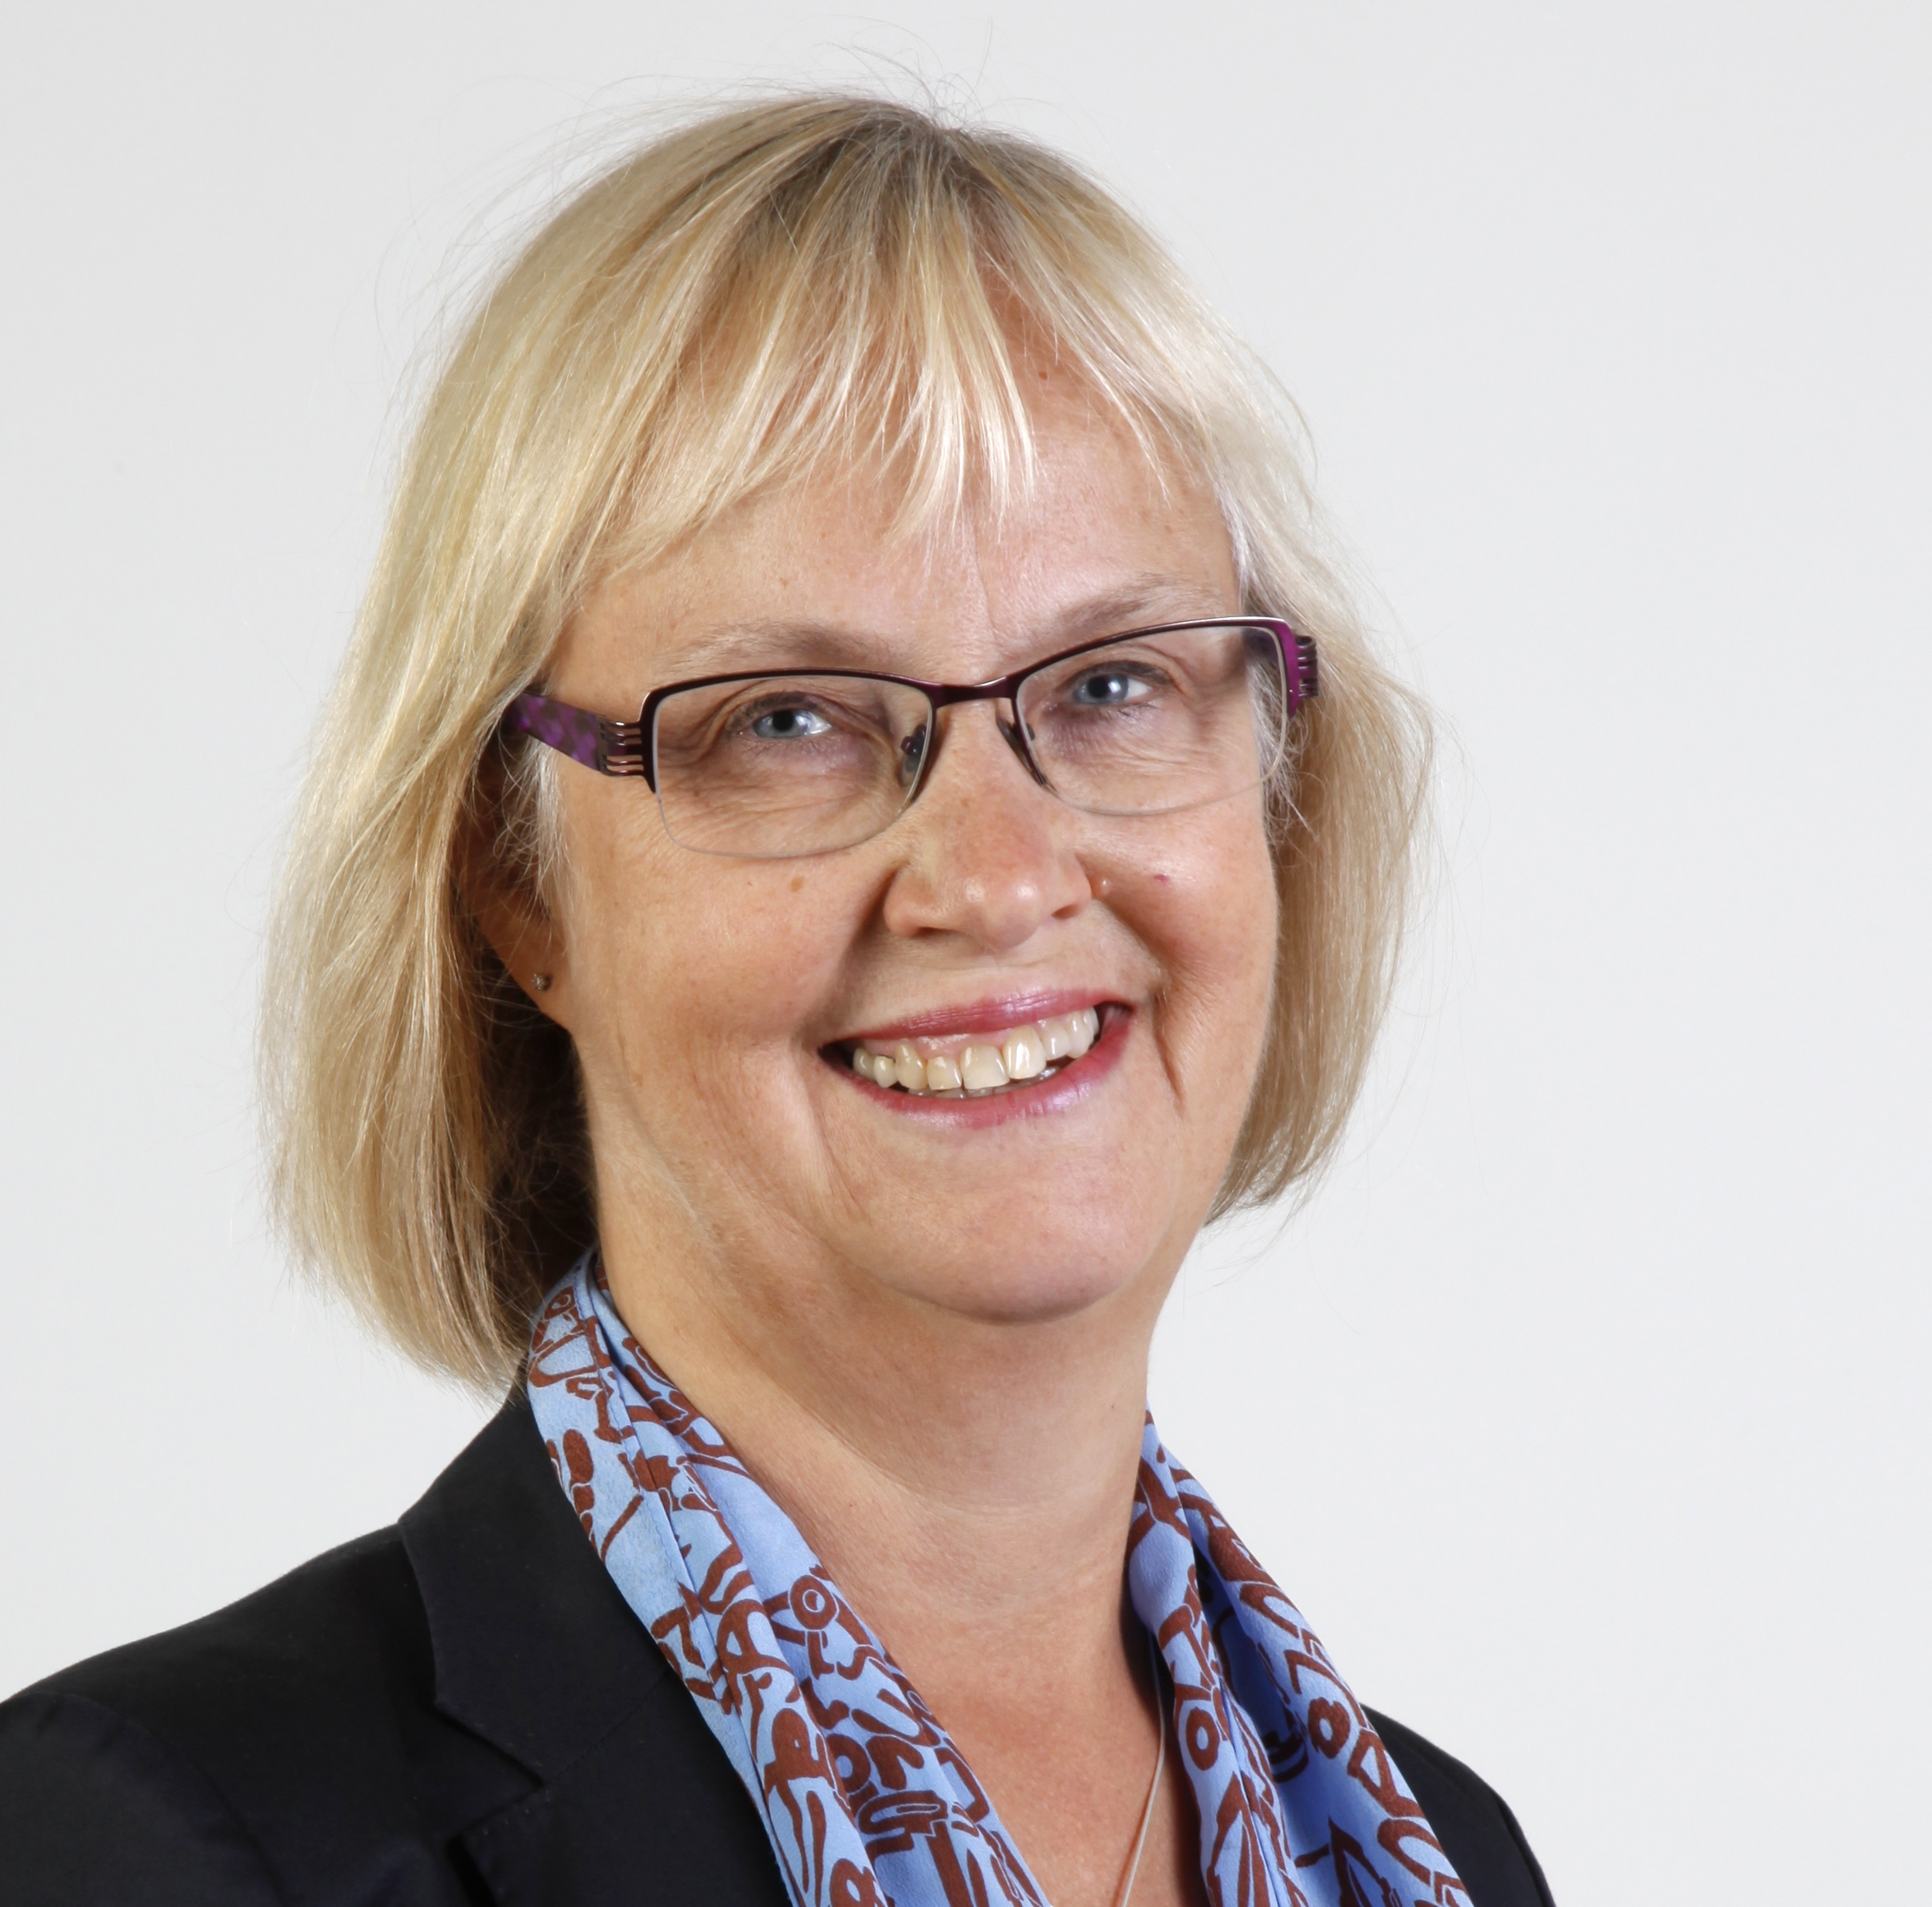 Lena Erixon, Trafikverkets generaldirektör